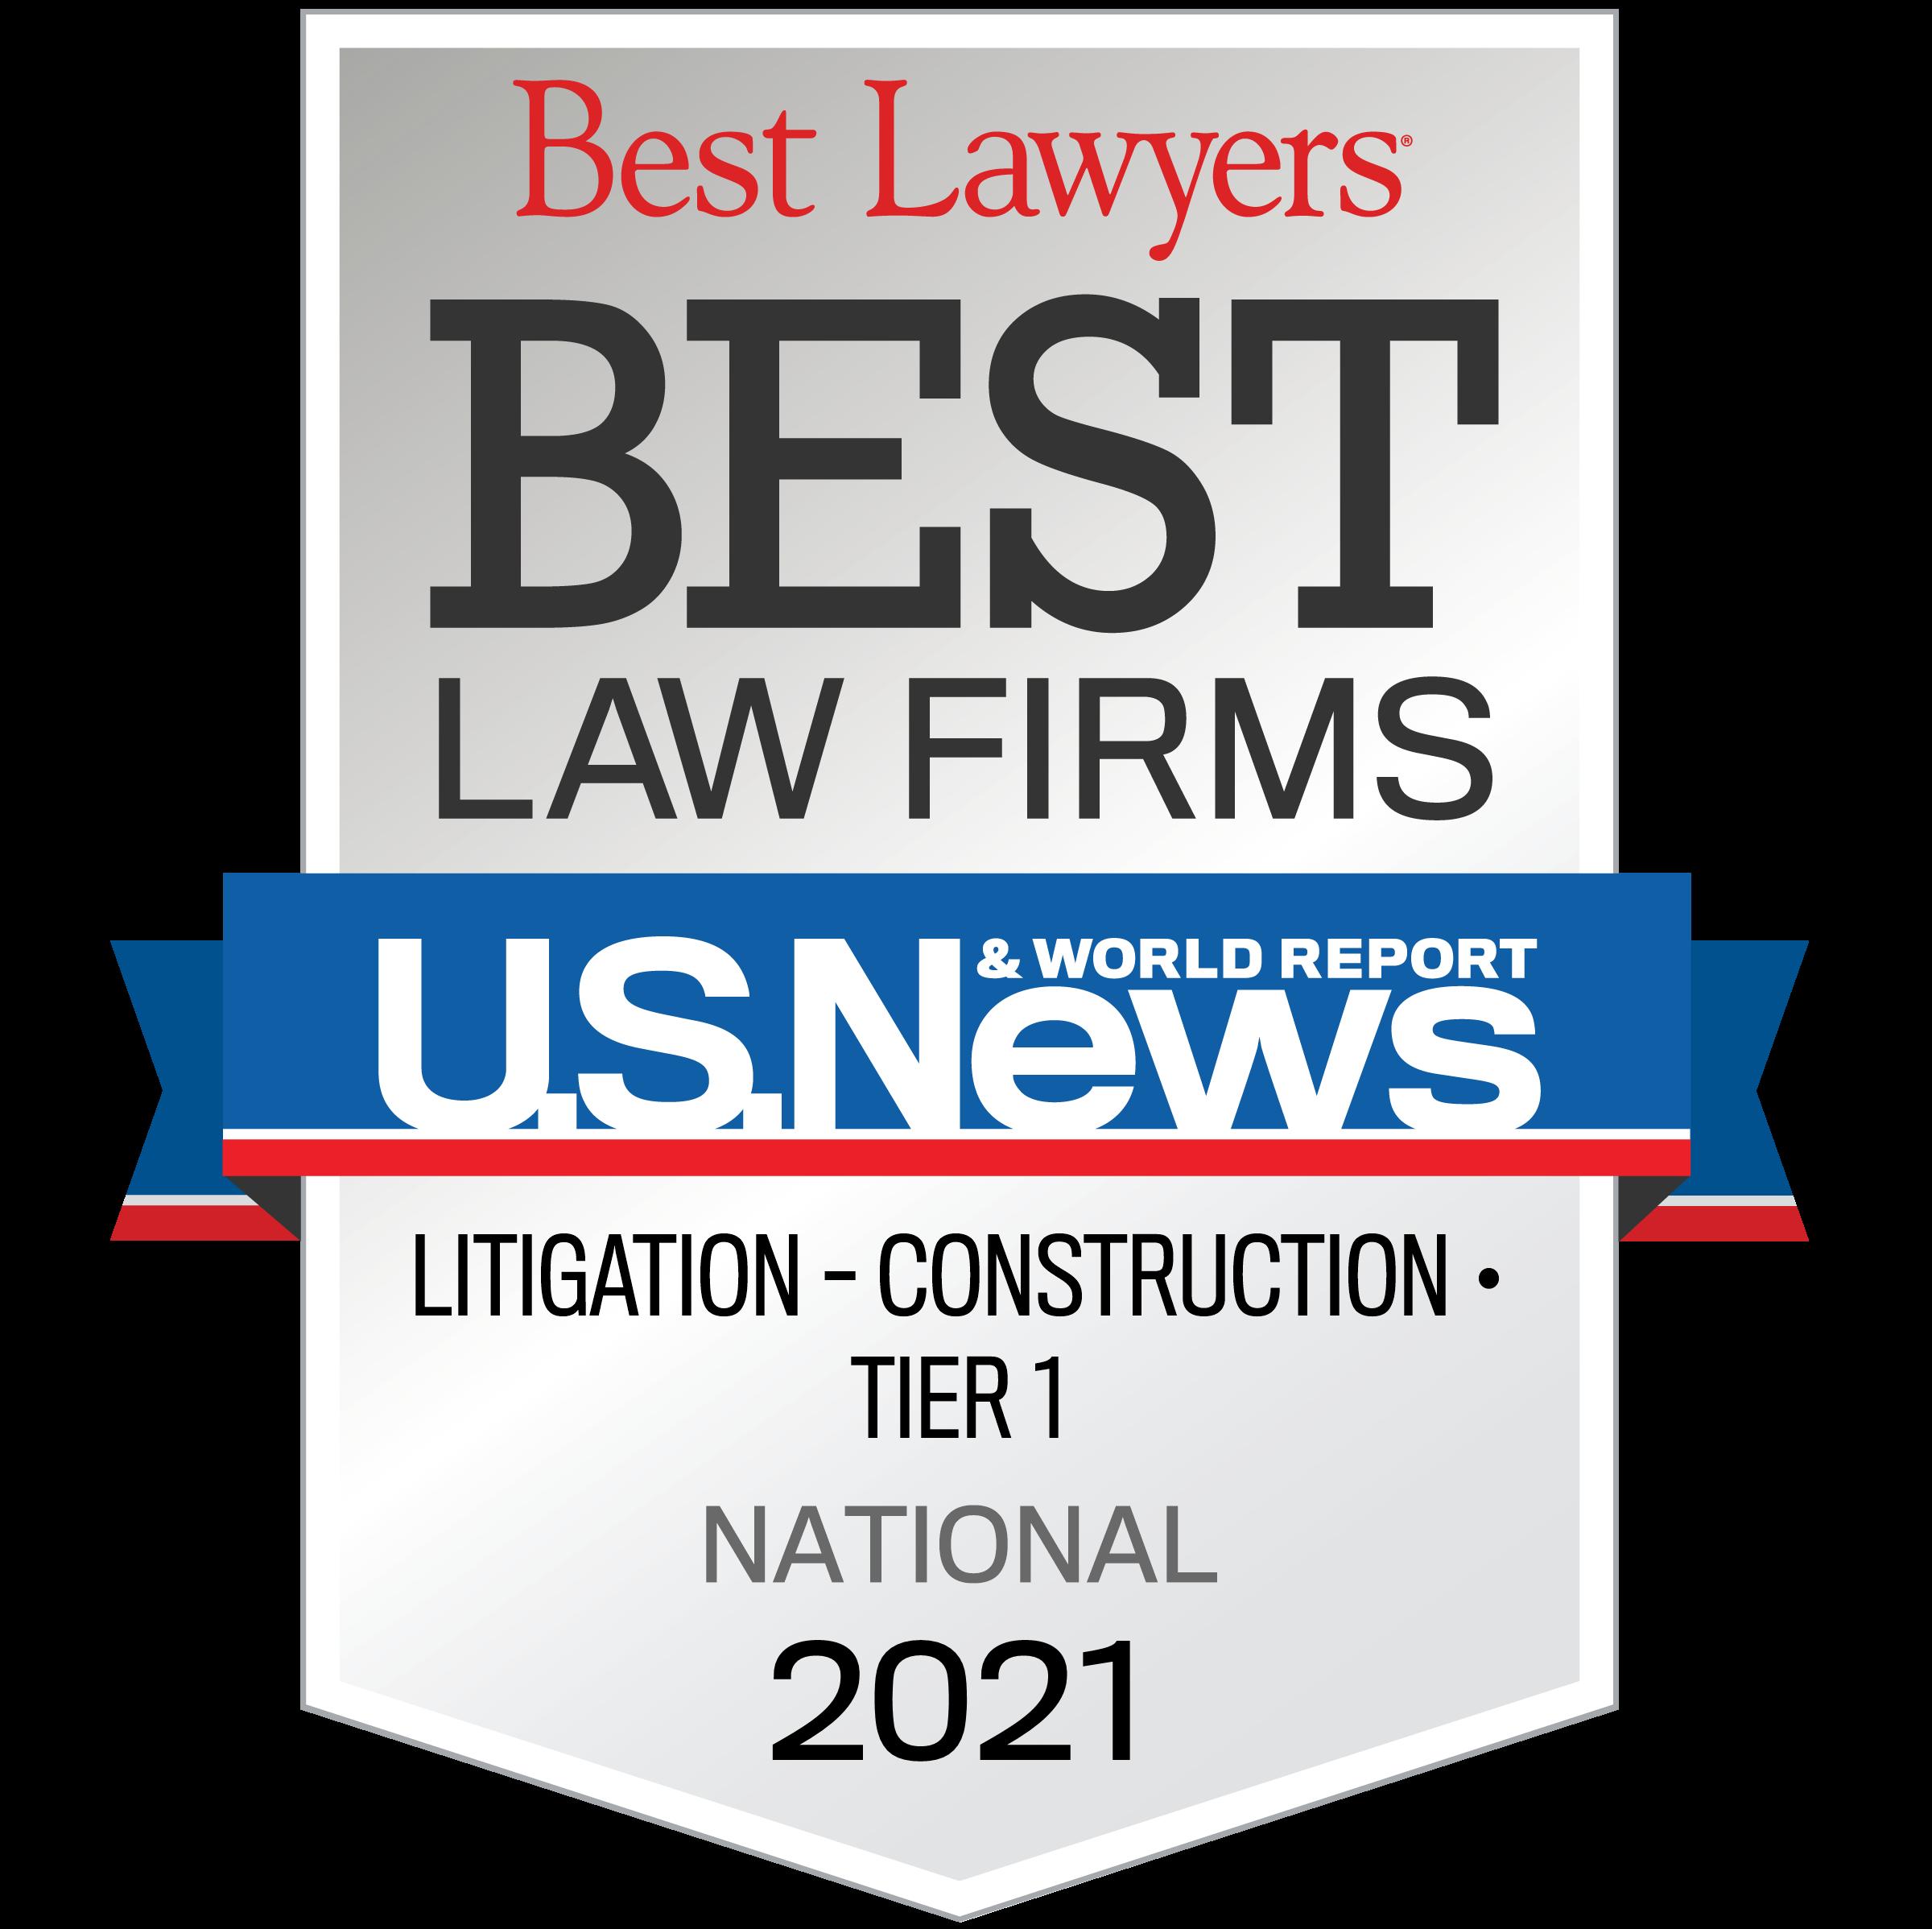 Litigation – Construction Tier 1 2021